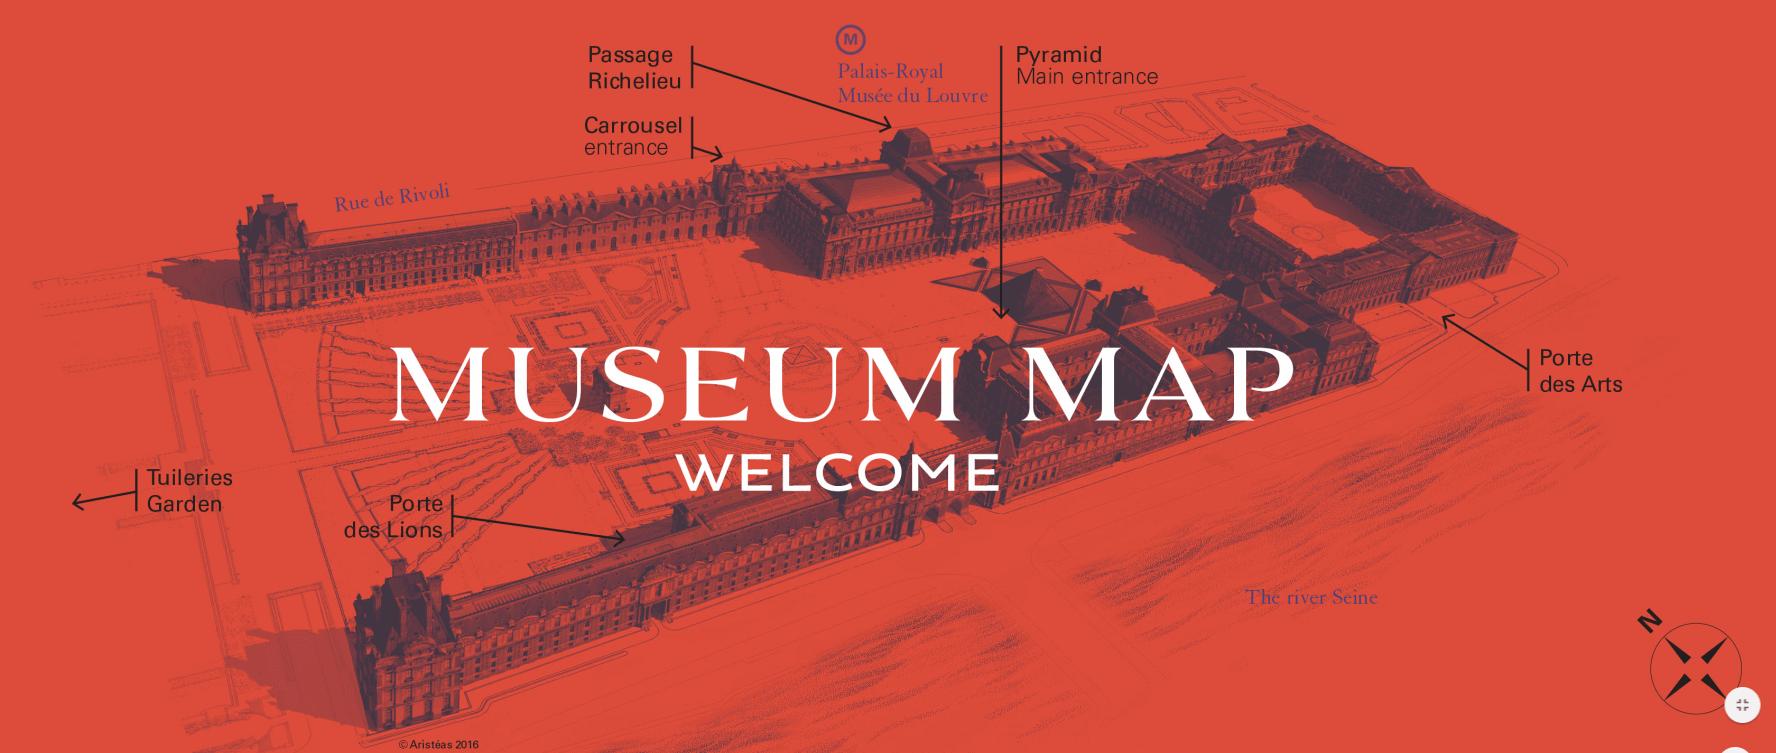 Louvre kaart museum